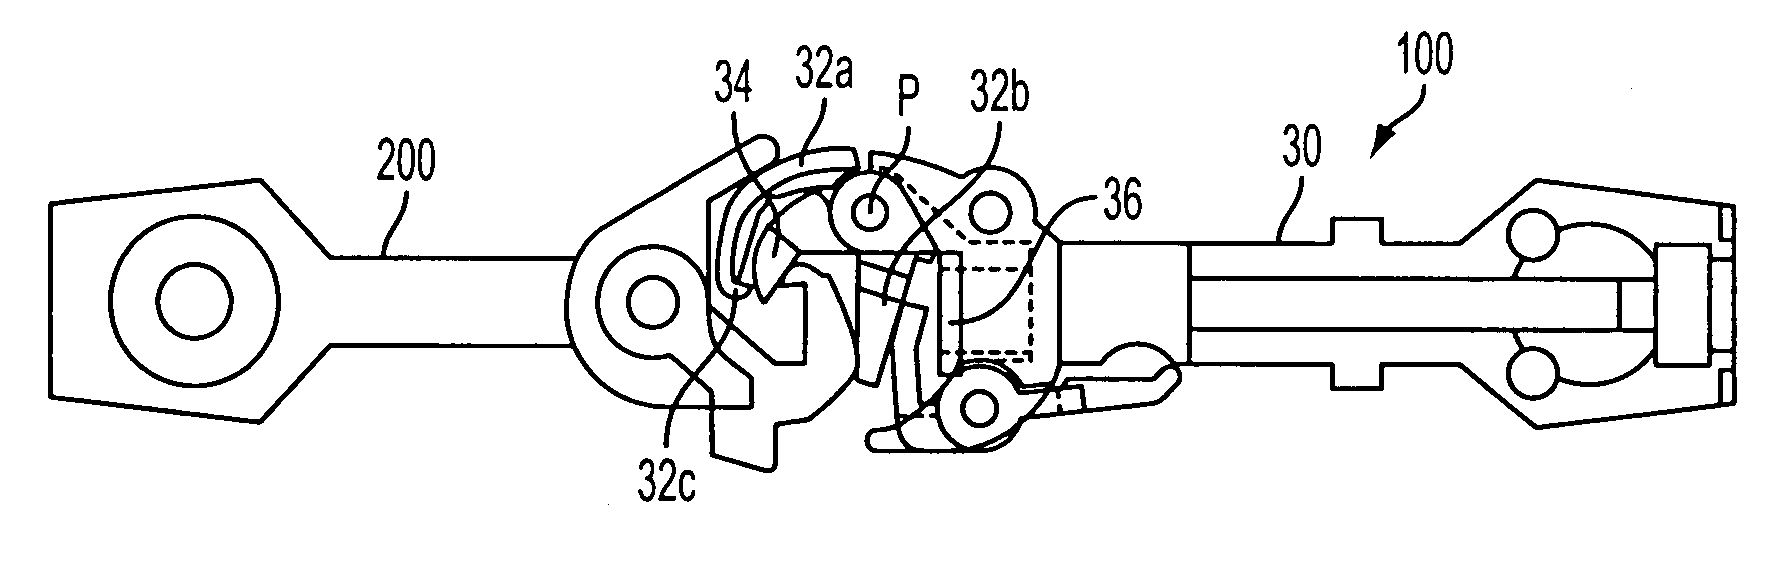 Mth Parts Diagrams Schematics Data Wiring Lionel Uncoupler Accessories Diagram Elsalvadorla K4 Electric Train